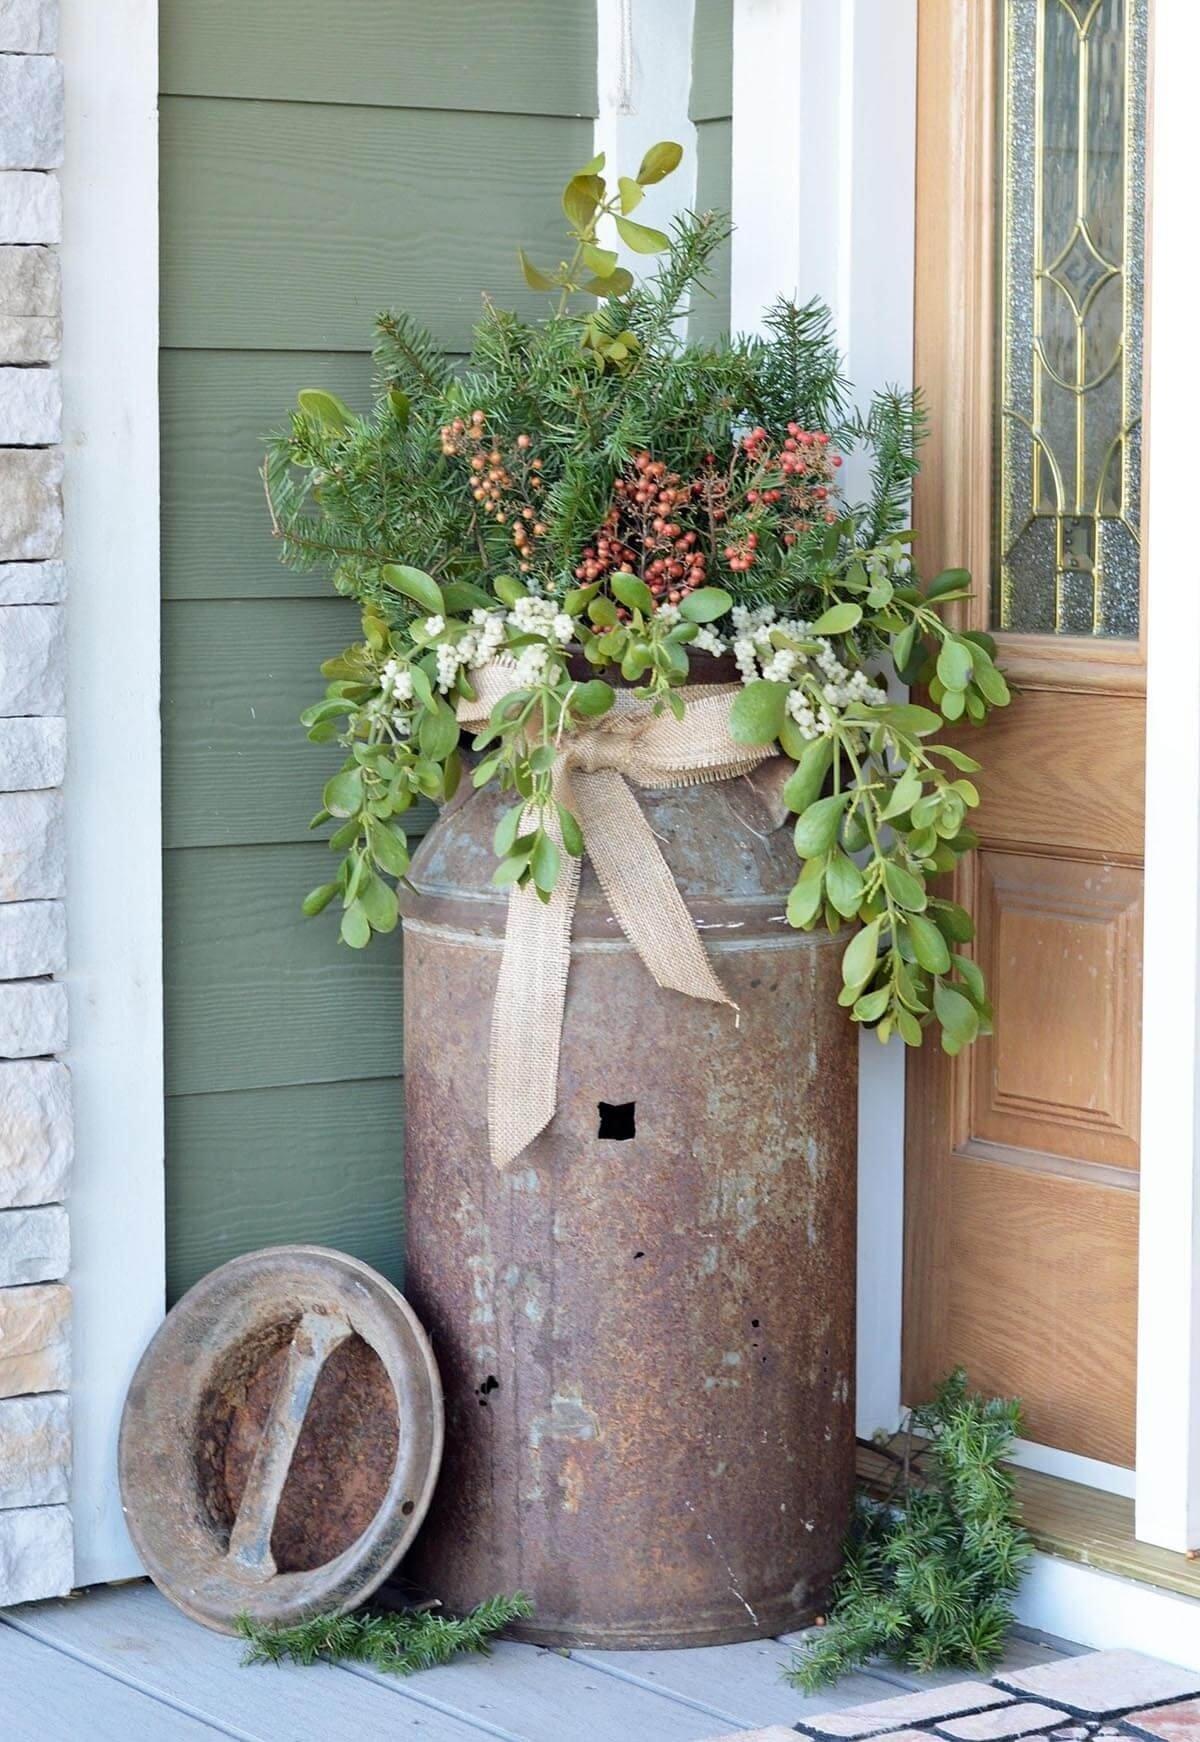 10 Fashionable Flower Pot Ideas For Front Porch 29 best front door flower pots ideas and designs for 2018 6 2021